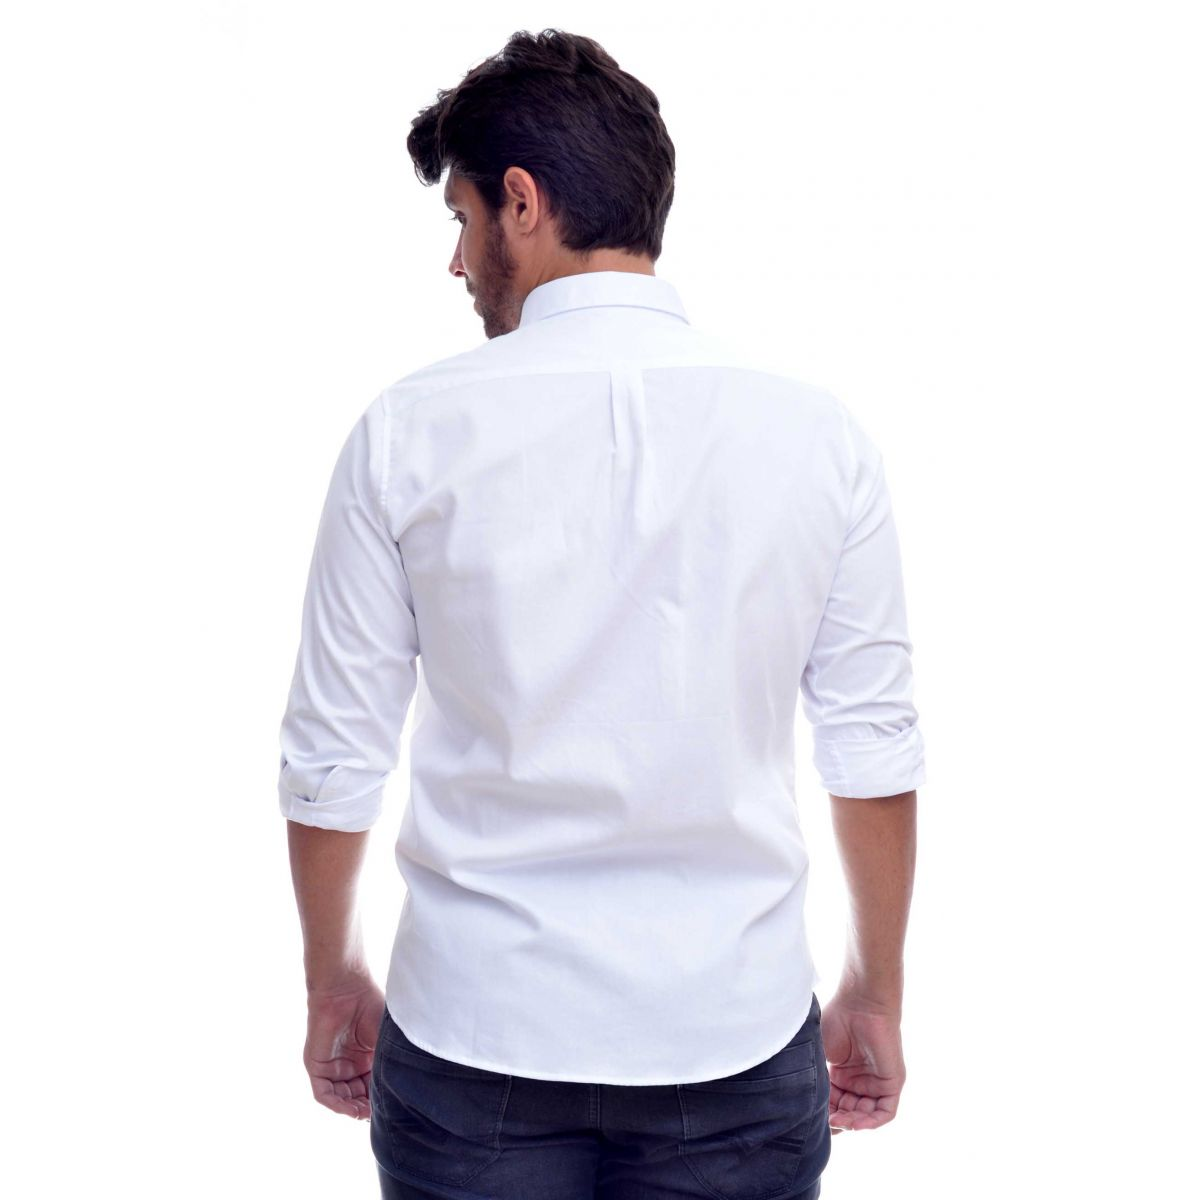 Camisa Social RL  Oxford Branco Colored - Custom Fit  - Ca Brasileira